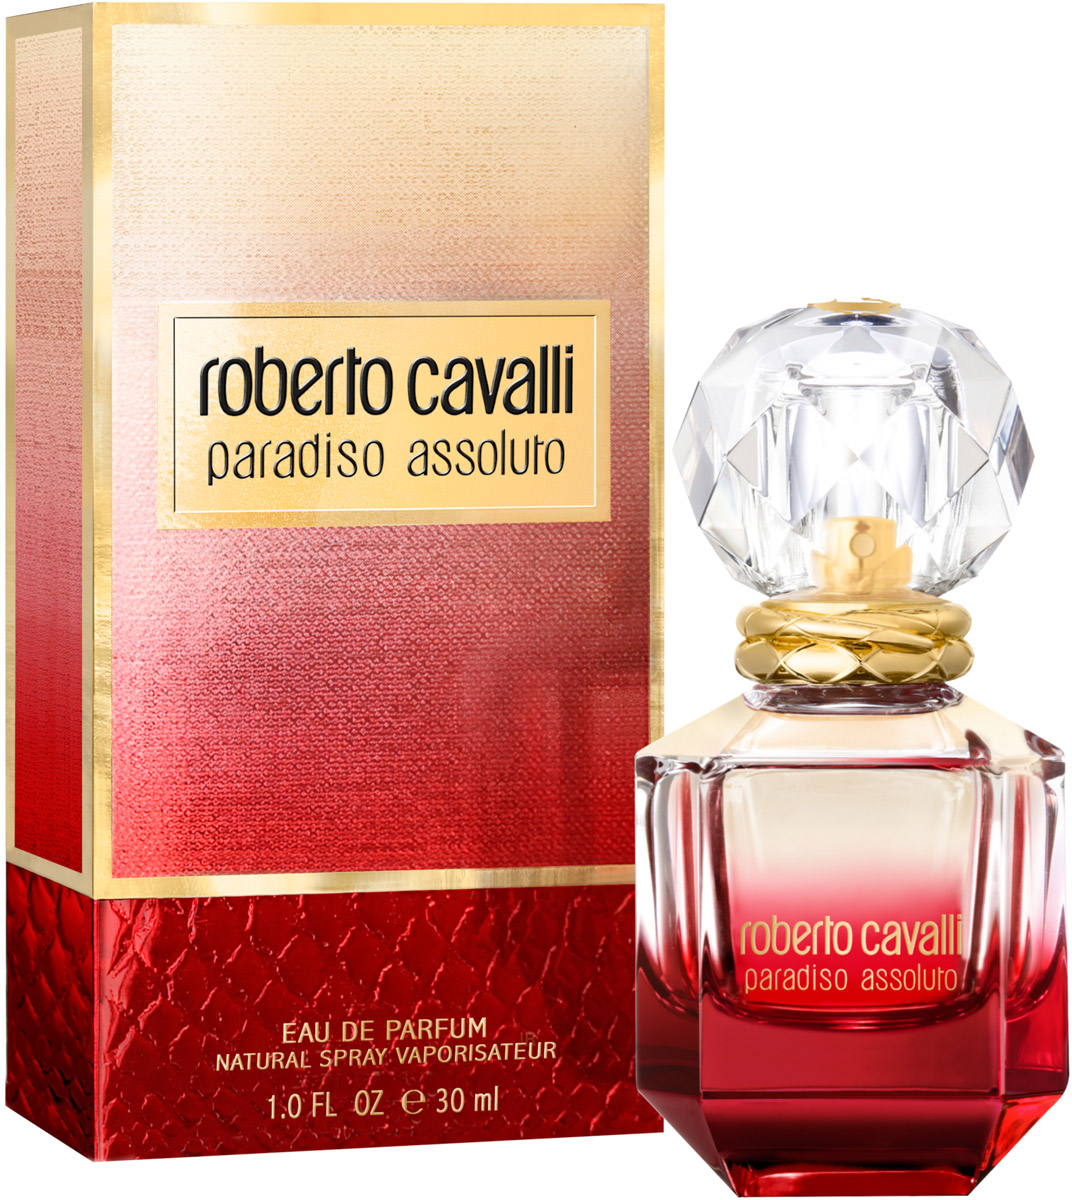 Roberto Cavalli Paradiso Assoluto женская Парфюмерная вода 30 мл roberto verino gold diamond парфюмерная вода 30 мл